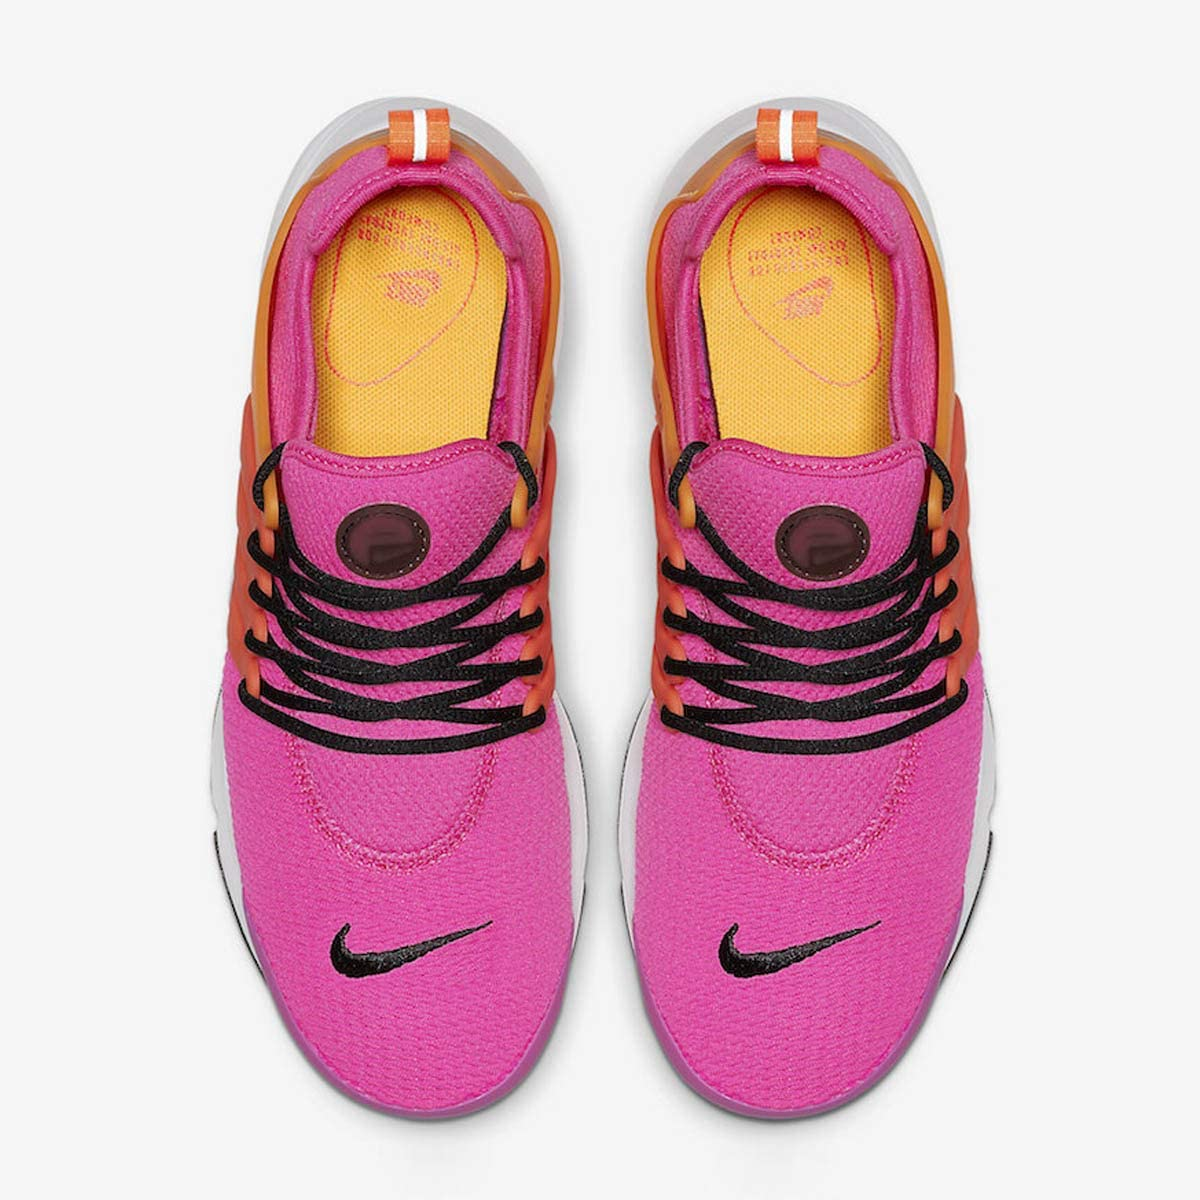 Nike Air Presto fuxia